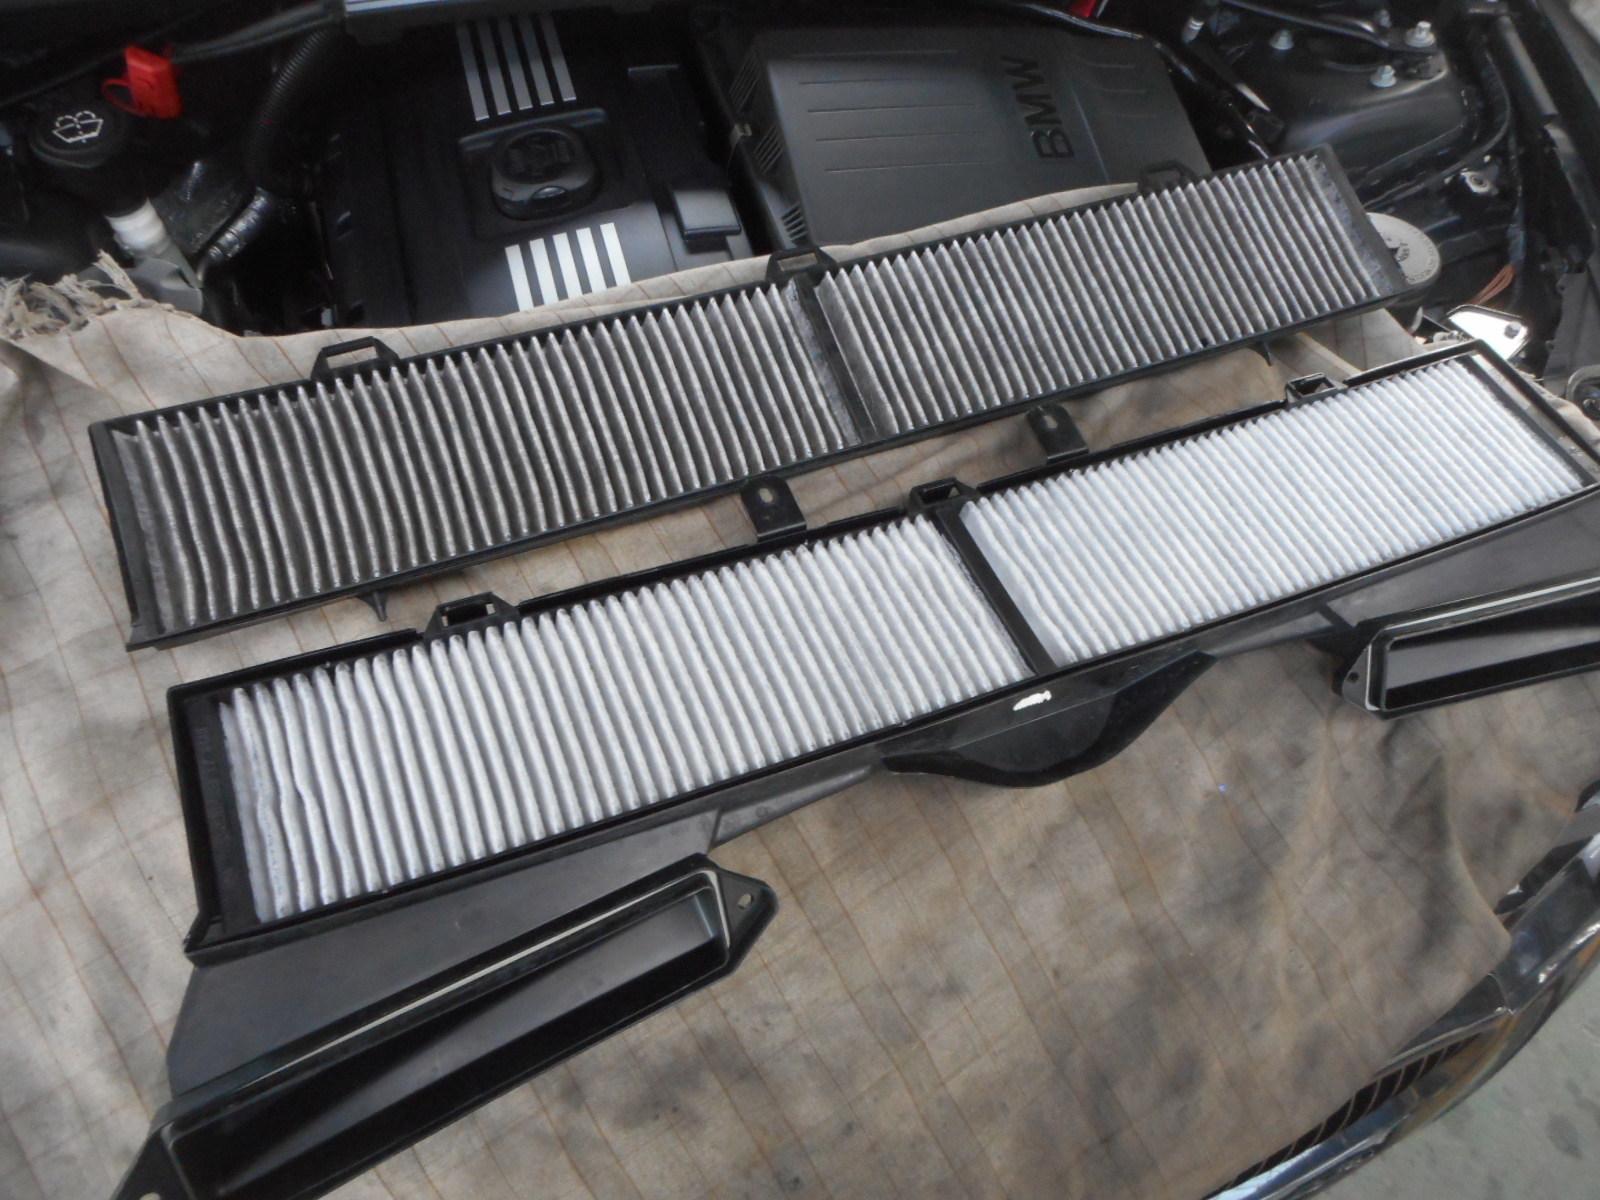 BMW335 クーペ (E90) エンジンオイル漏れ修理 納車整備_c0267693_17111215.jpg